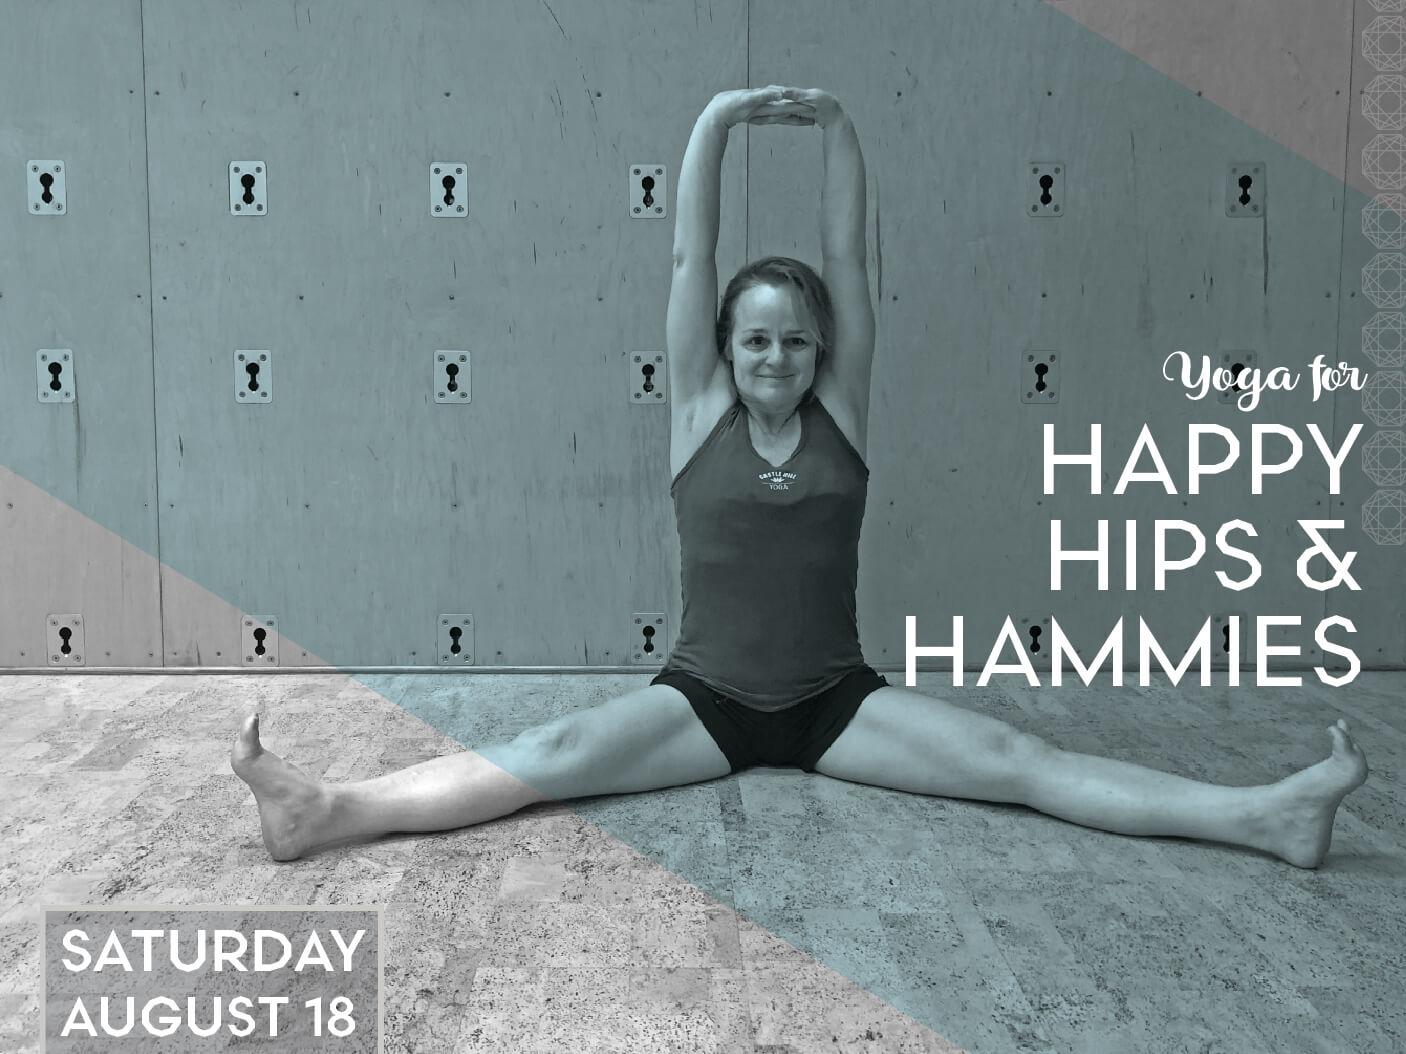 Yoga for Happy Hips & Hammies